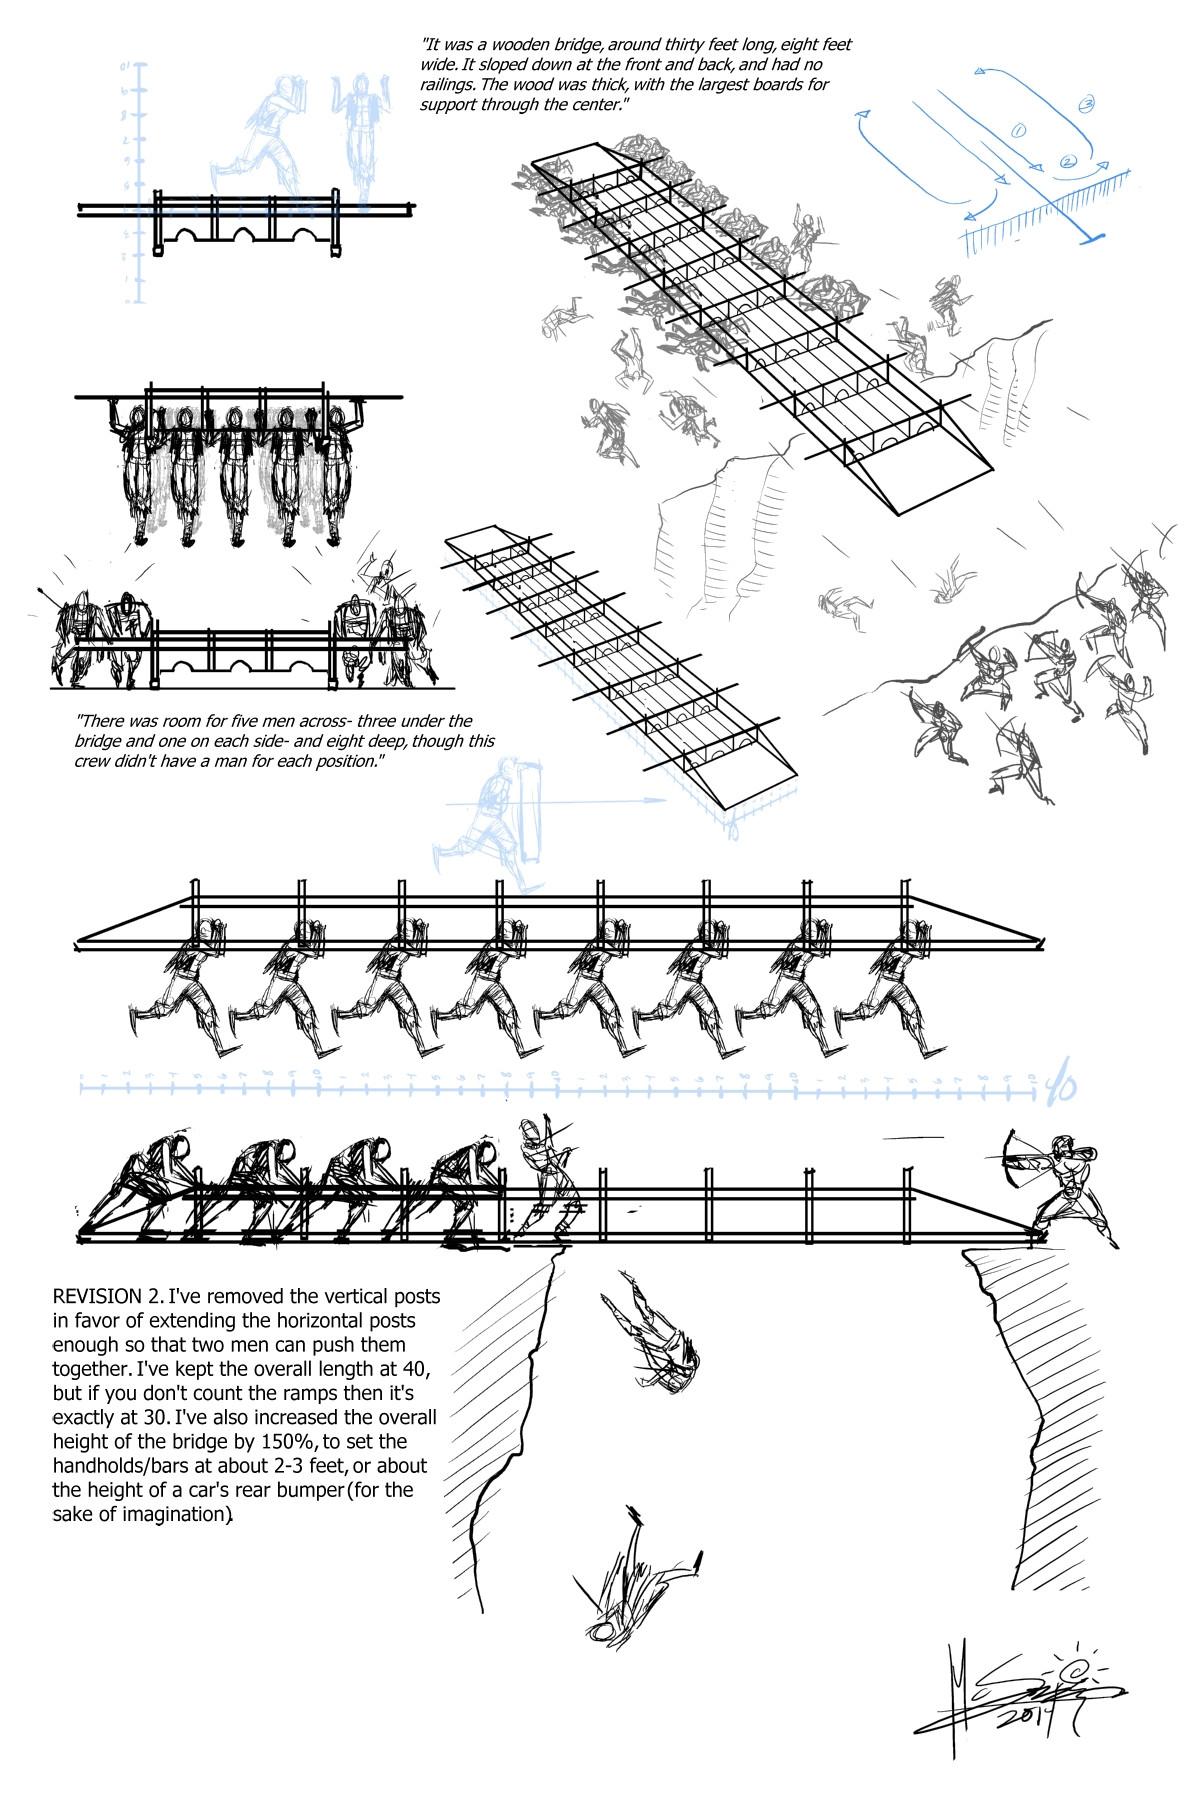 Carga con puente, por Ben McSweeney (Arte conceptual)